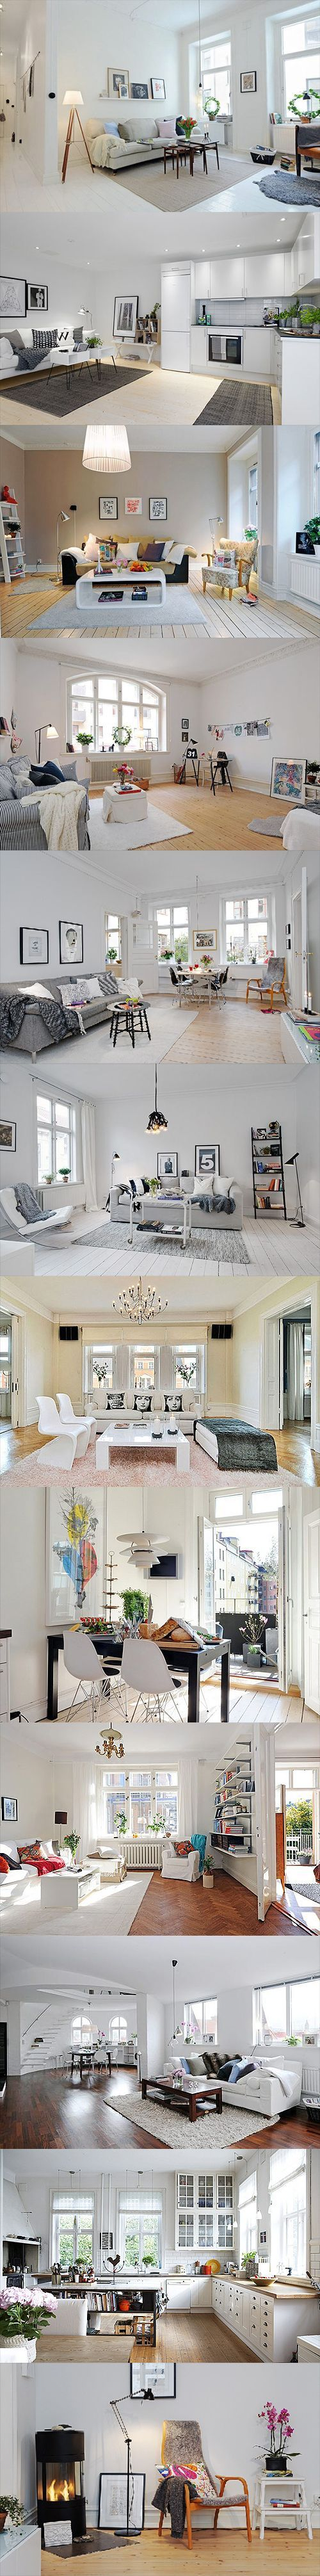 Beautiful & Stylish Scandinavian interior design inspiration 02